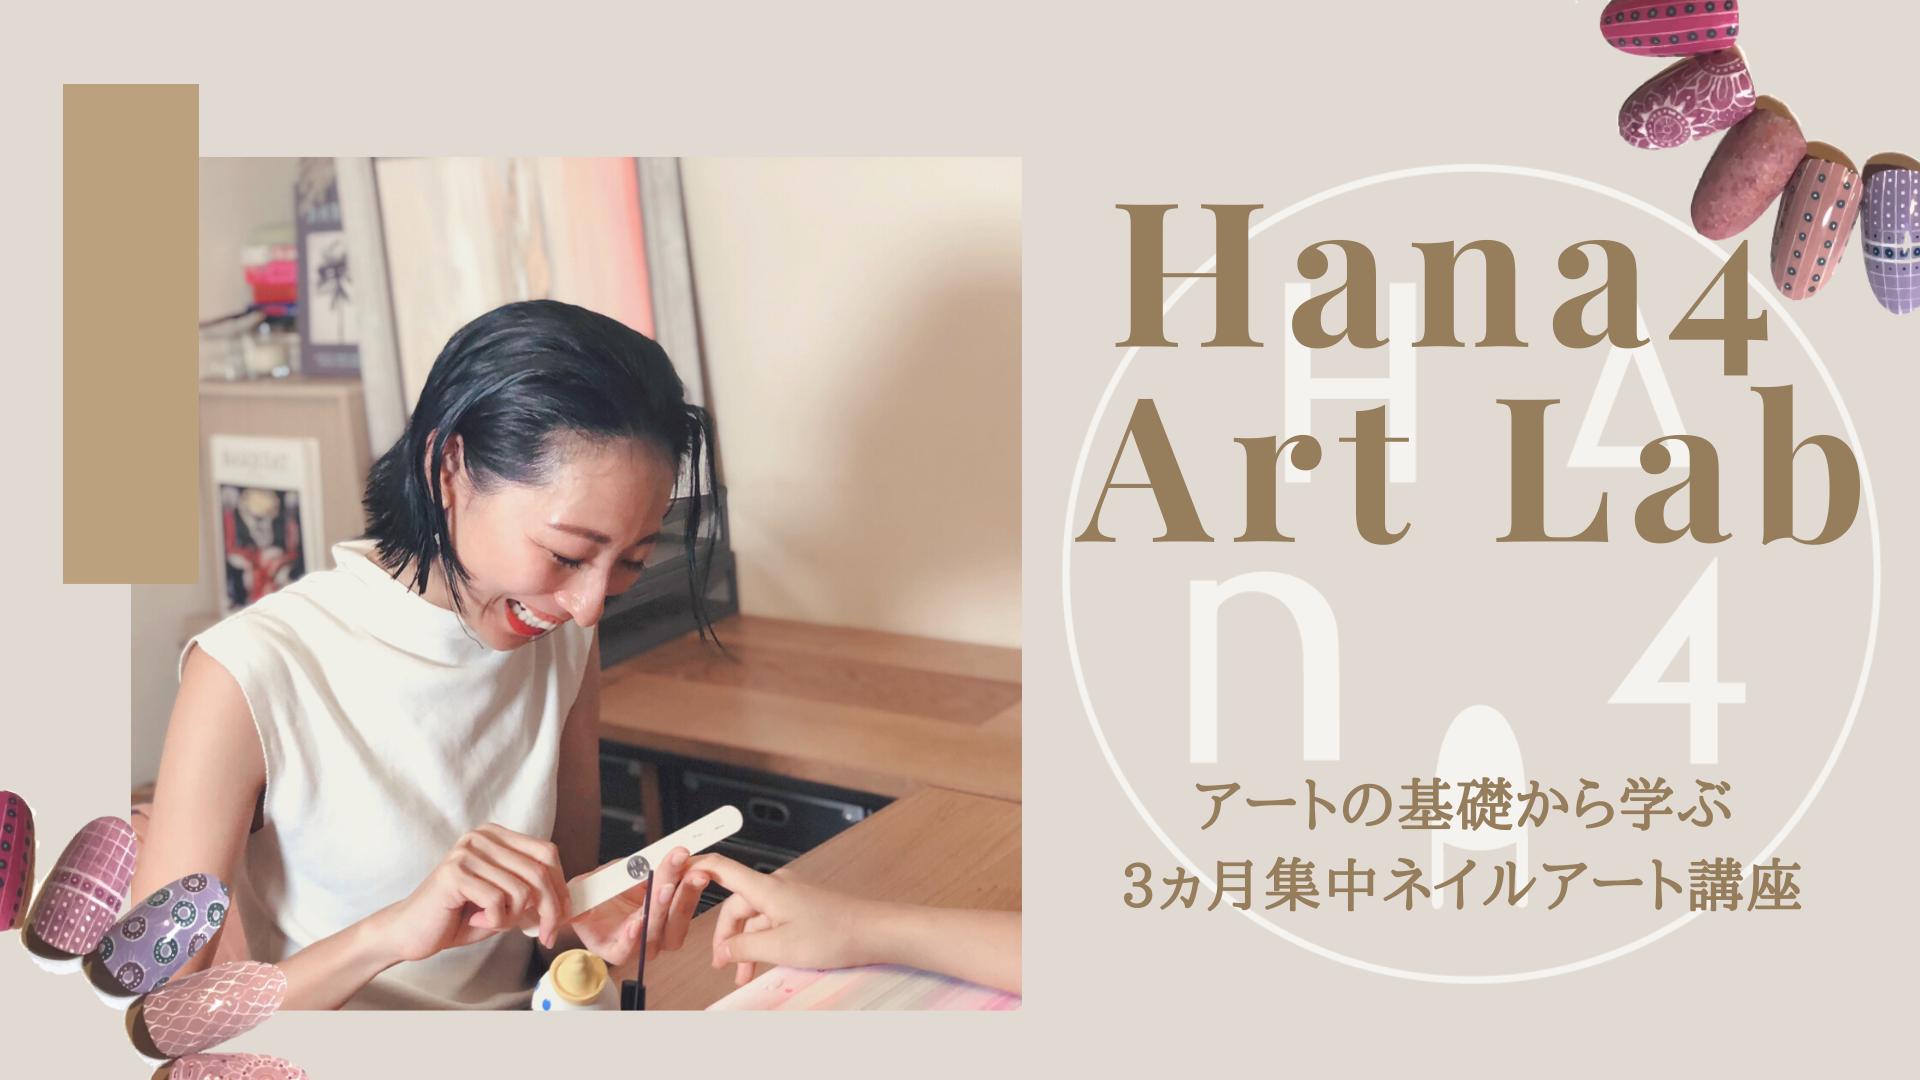 Hana4 Art Lab -3ヶ月集中ネイルアート講座-